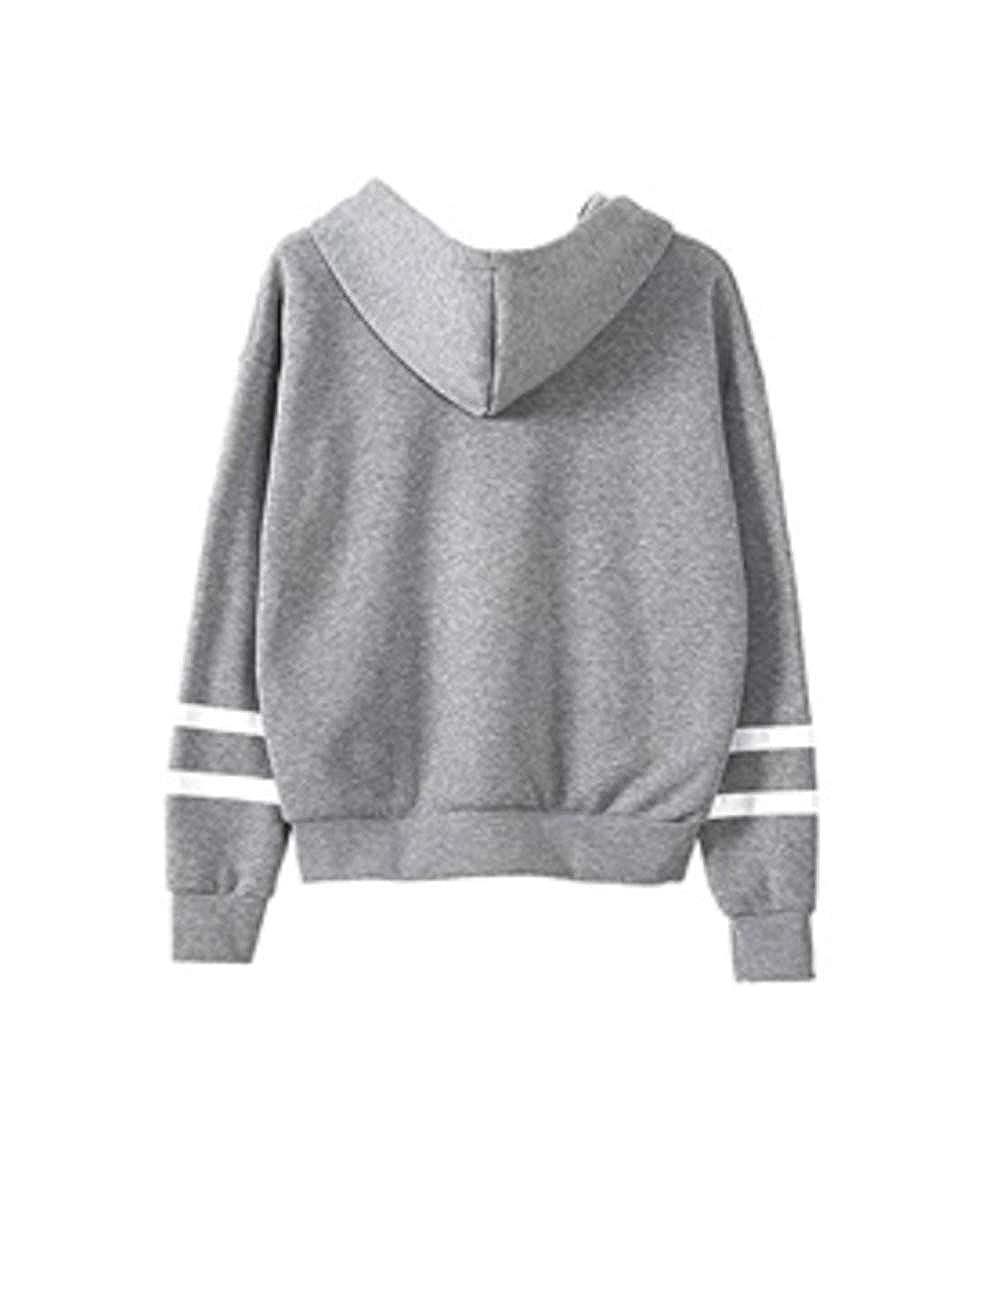 Women Hoodie Sweatshirt Teen Girls Stripe Long Sleeve Loose Pullover Jumper Sweater Jacket Shirts Tops